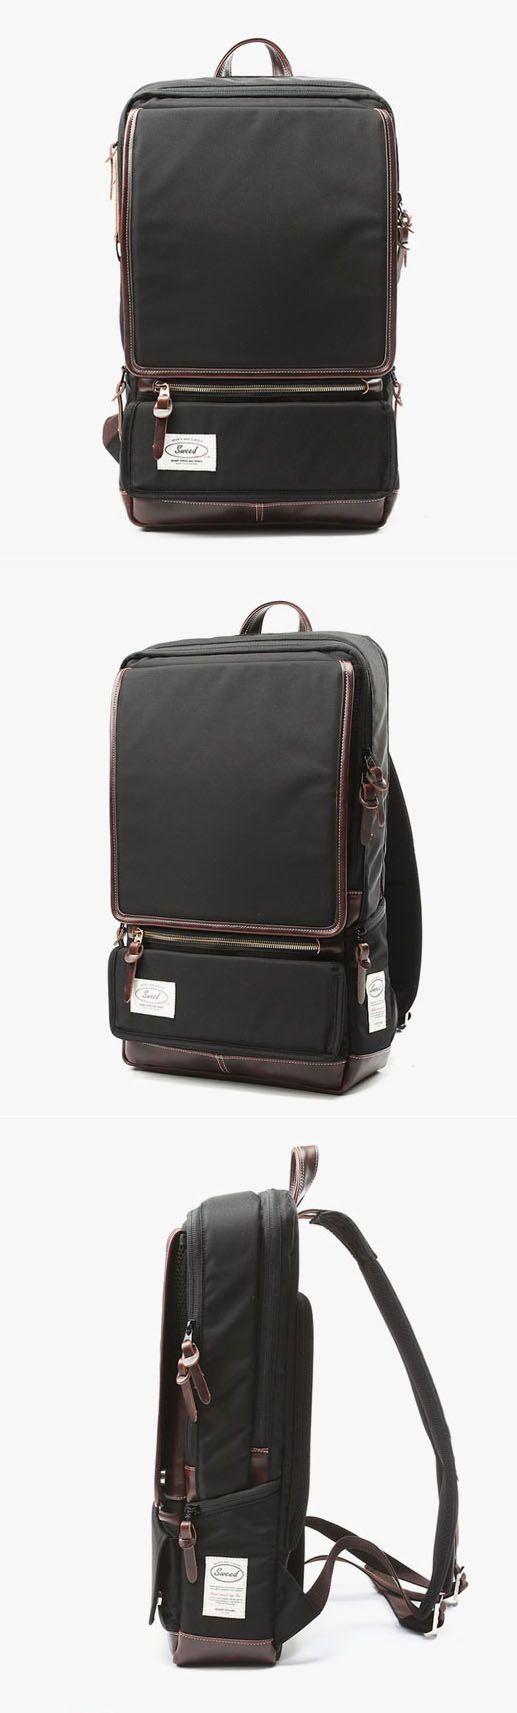 Noart - Sweed Define RF laptop backpack